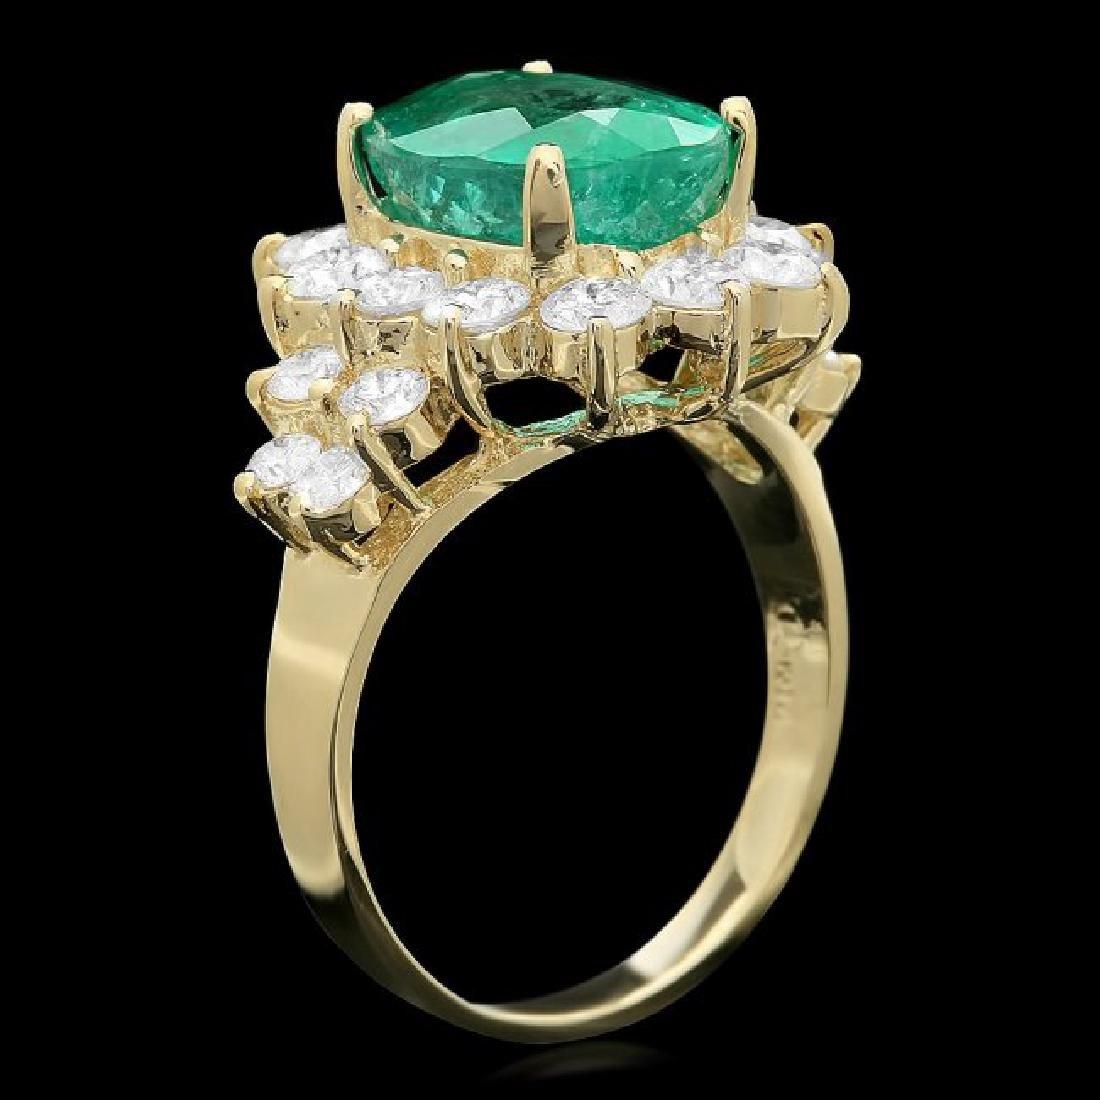 14k Gold 4.00ct Emerald 1.75ct Diamond Ring - 2